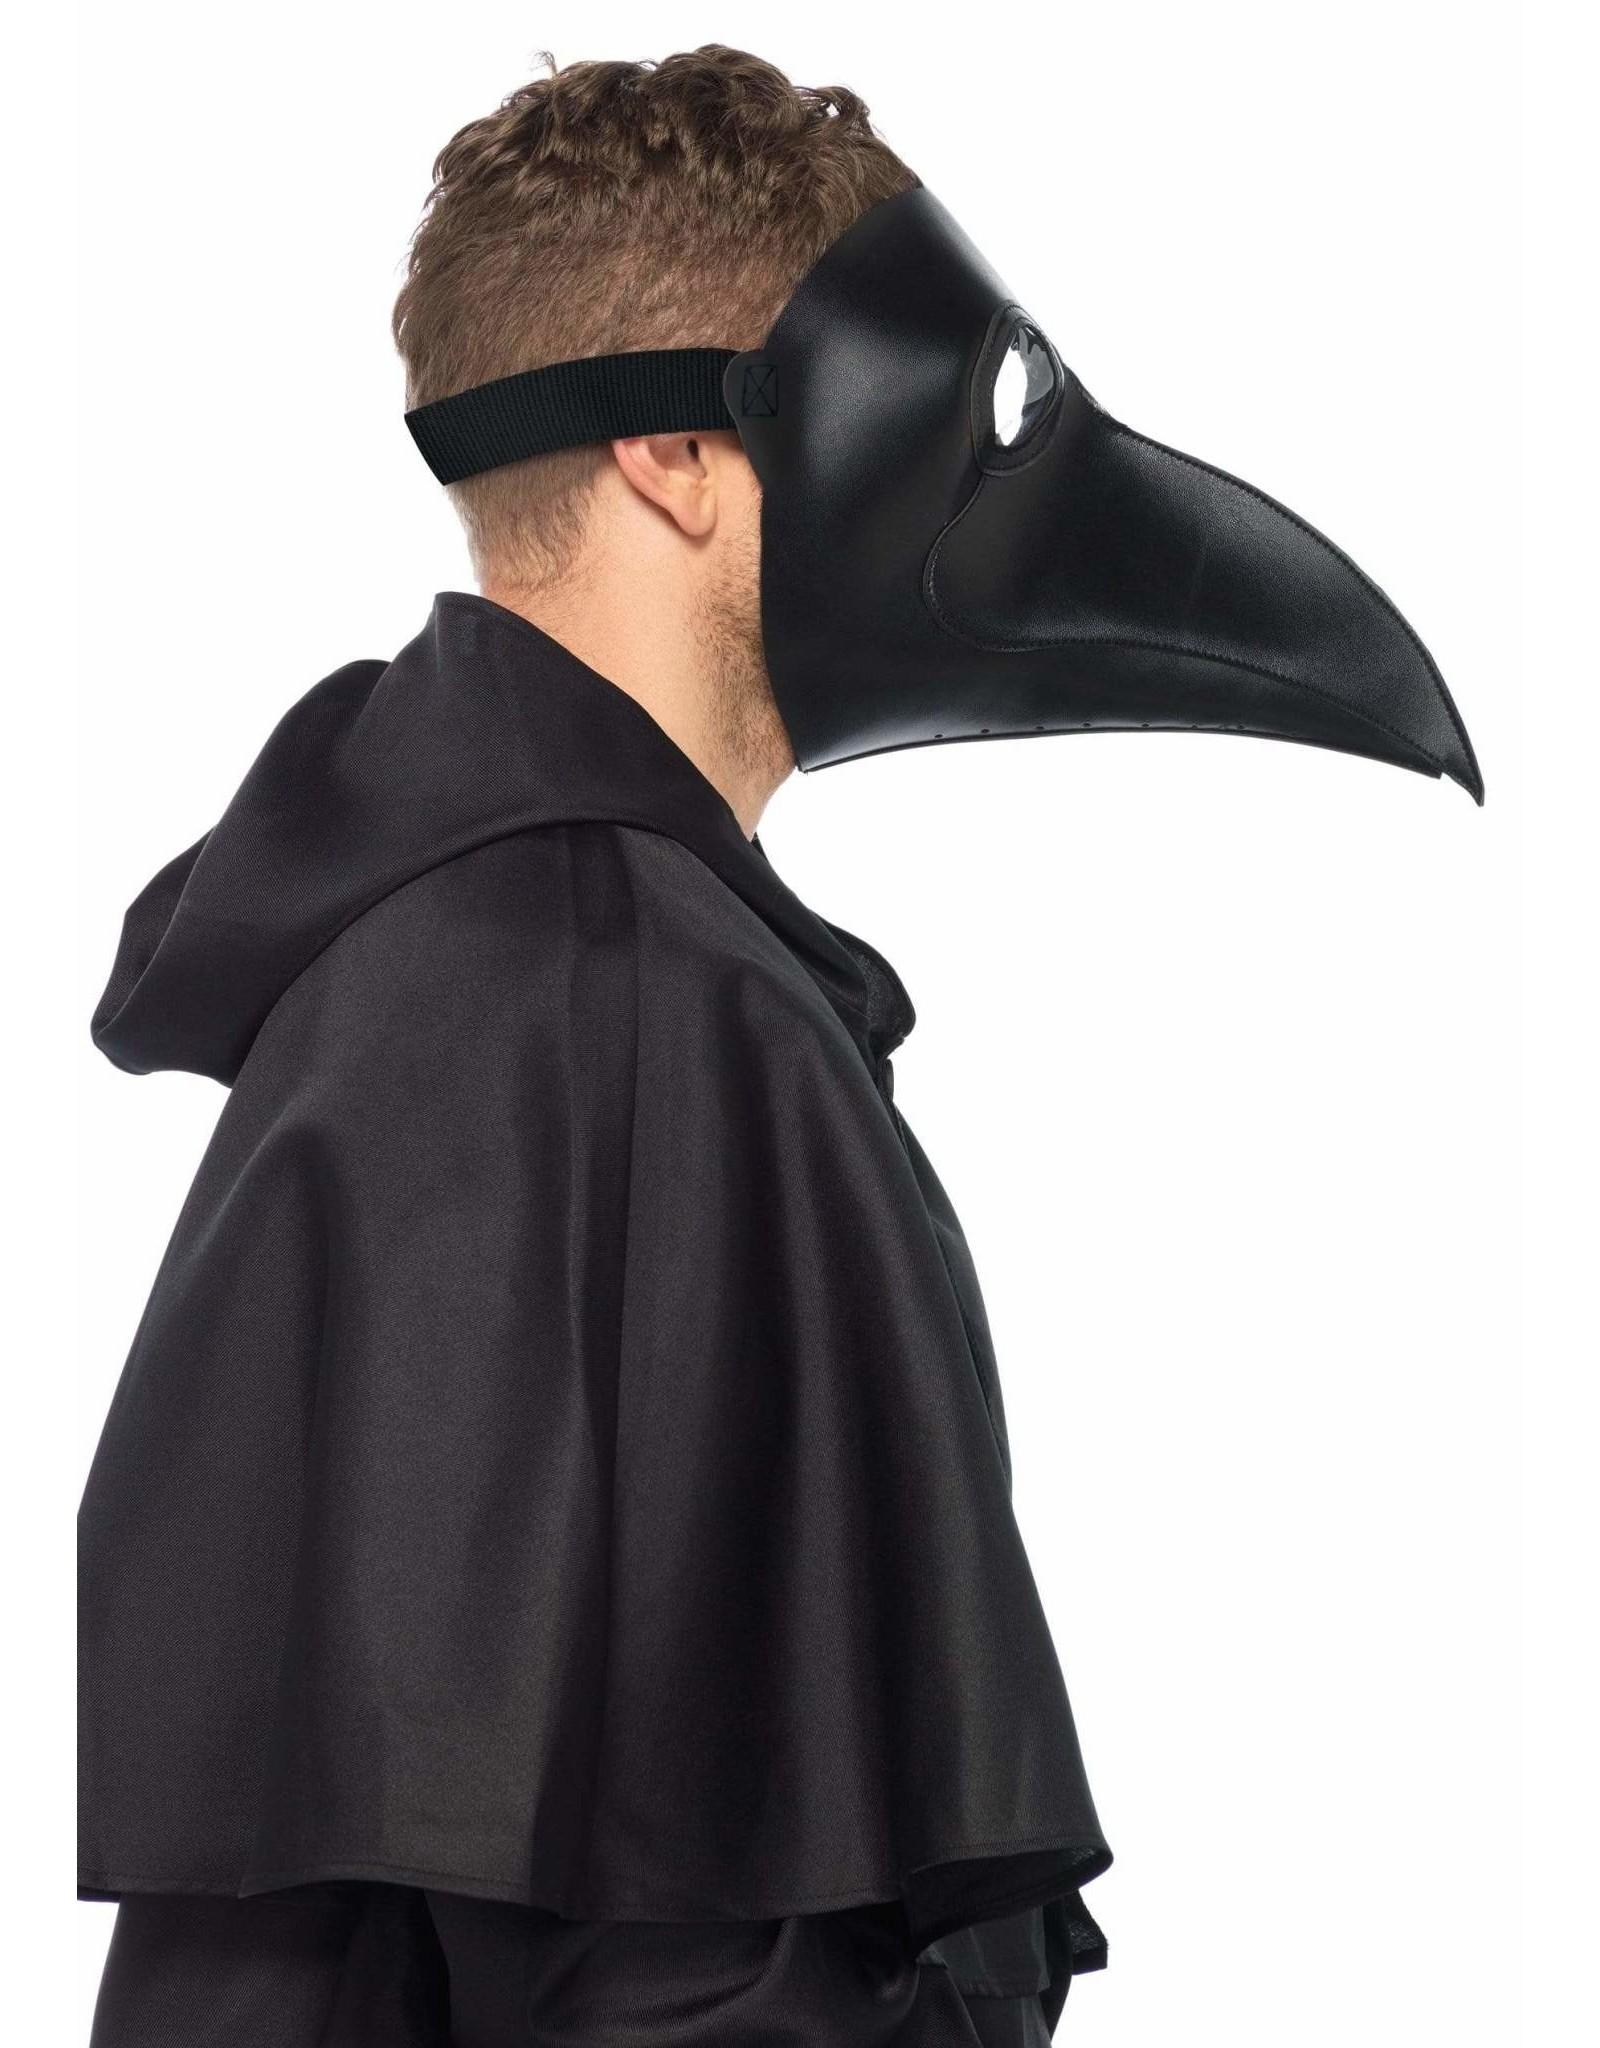 Leg Avenue Plague Doctor Mask